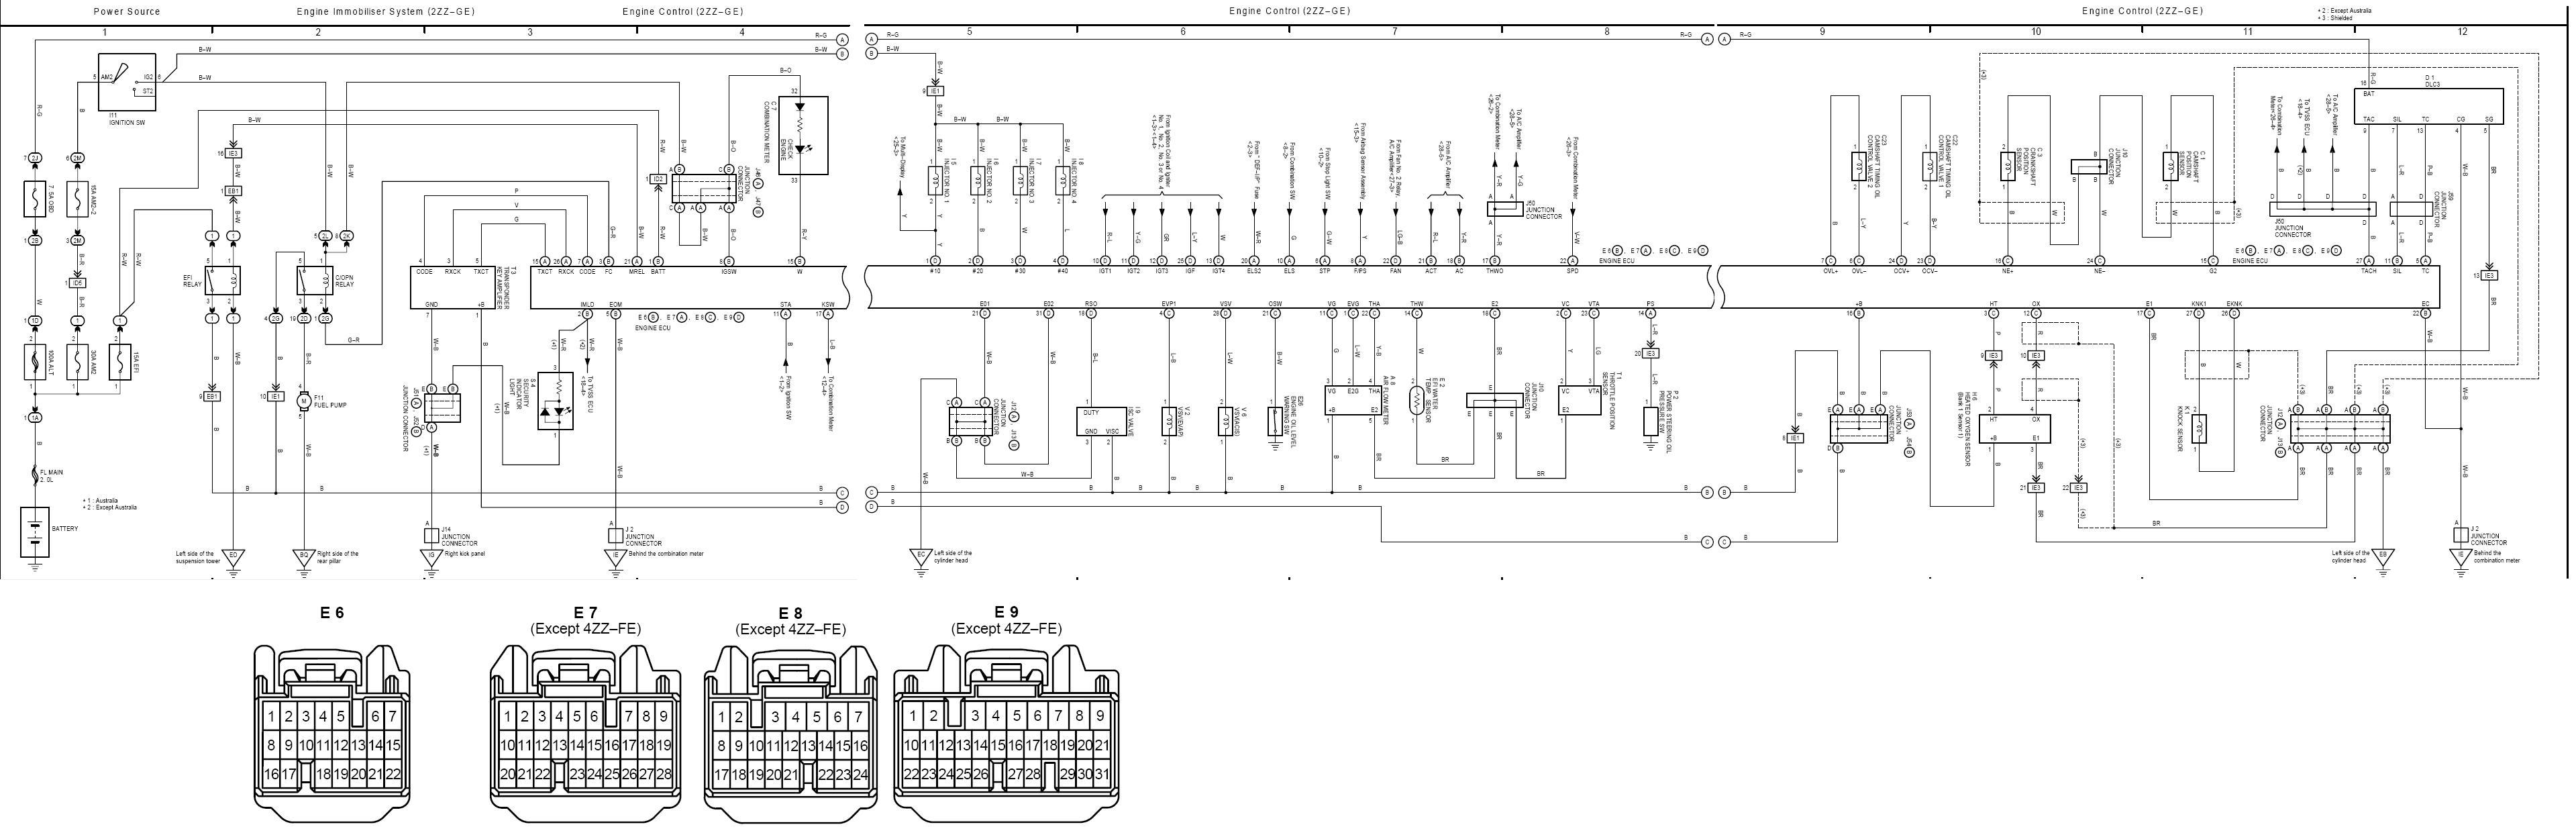 ecu wiring diagram corolla corolla sportivo club toyota toyota tacoma wiring diagram toyota corolla zze122r wiring diagram #1